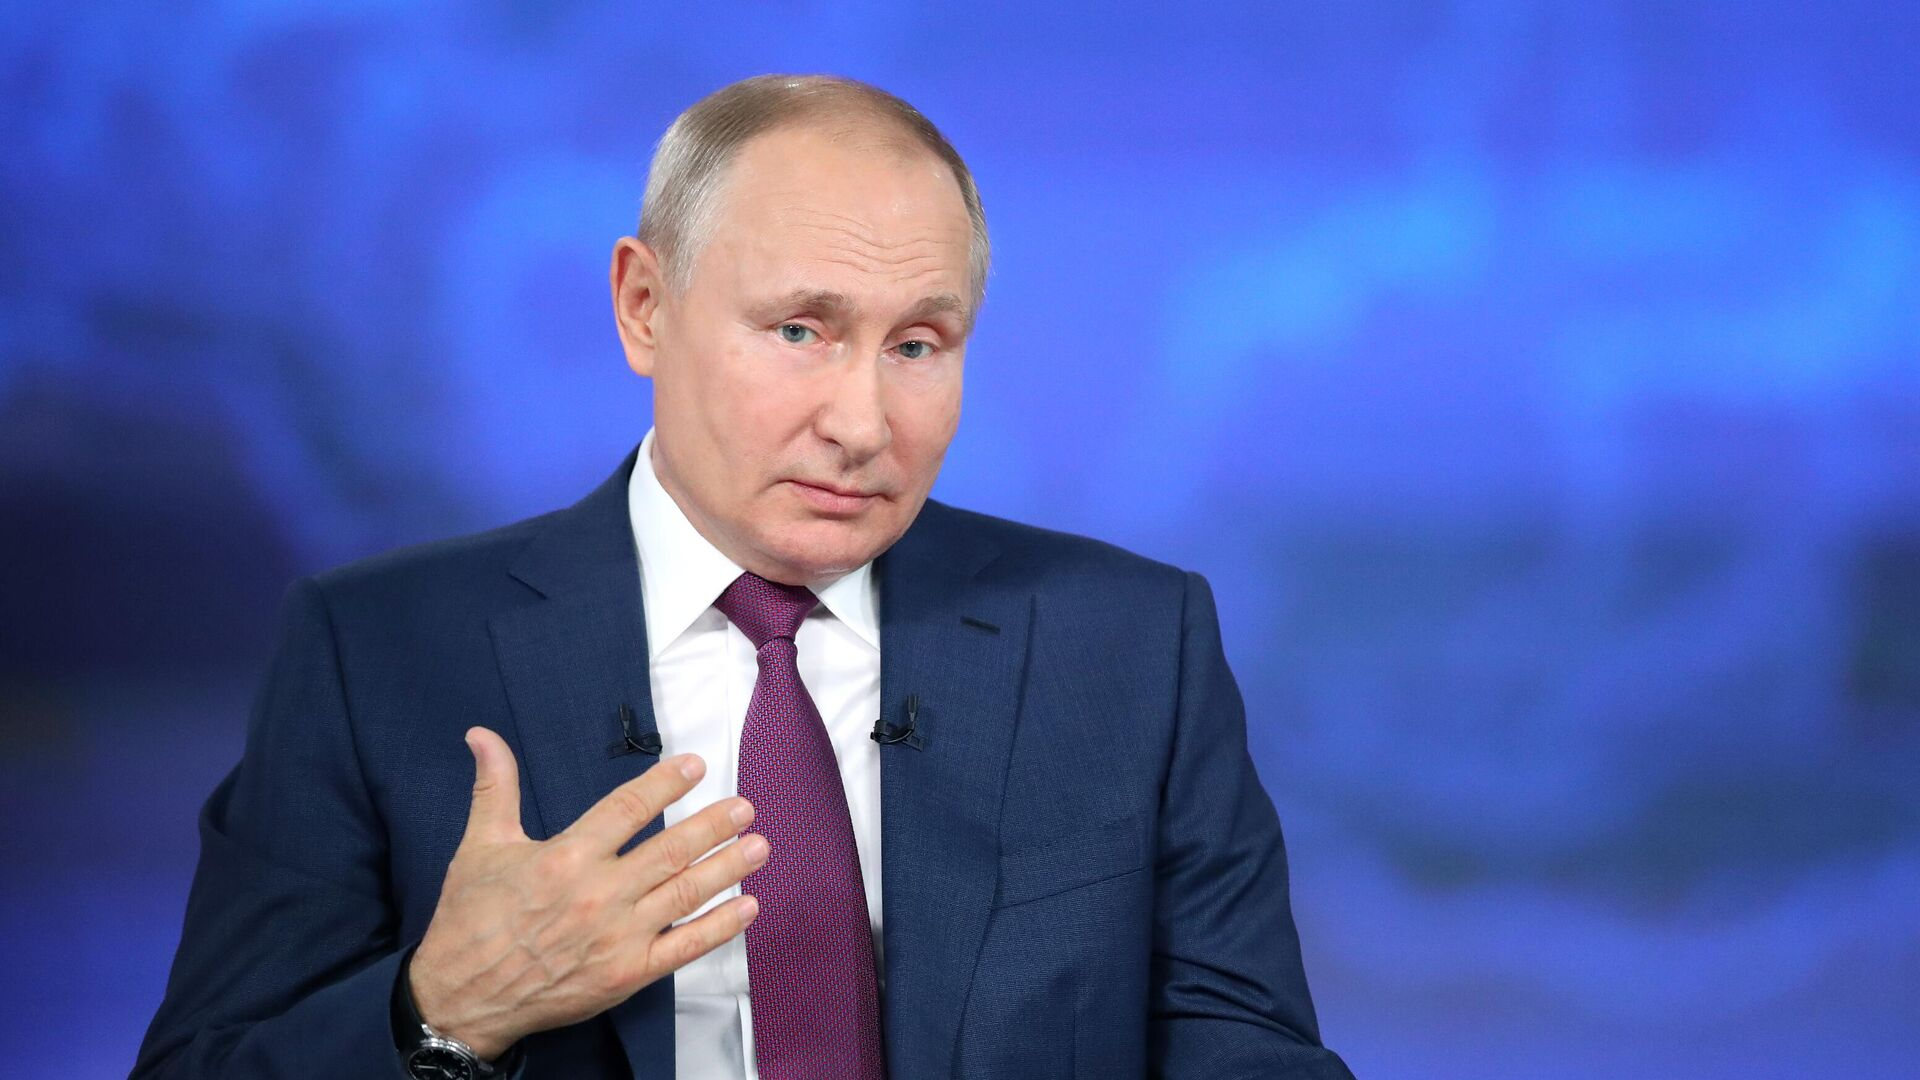 Línea directa con Vladímir Putin 2021 - Sputnik Mundo, 1920, 13.07.2021